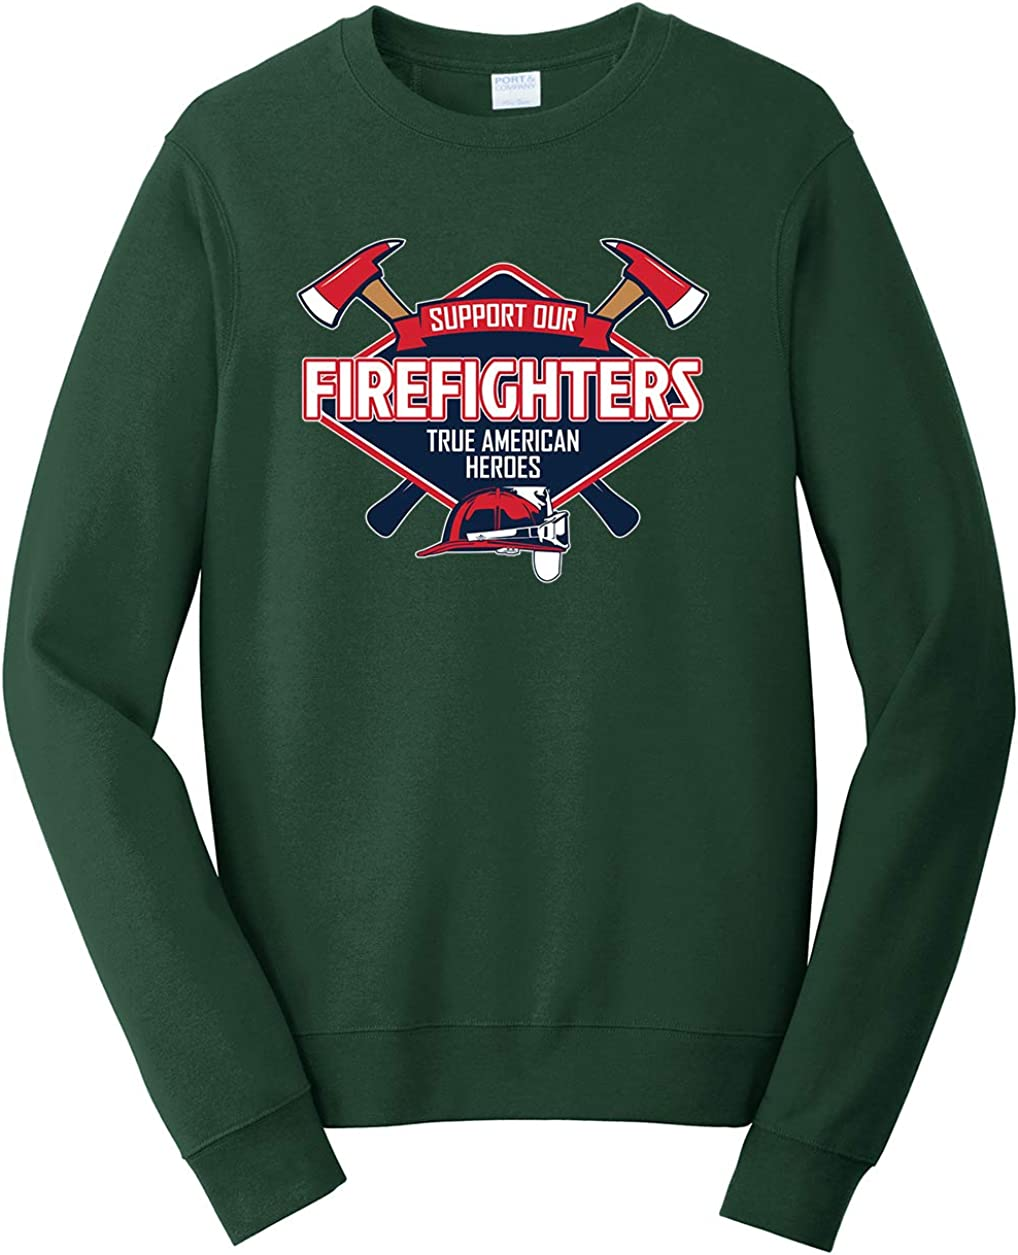 Tenacitee Unisex Support Our Firefighters American Heroes Sweatshirt